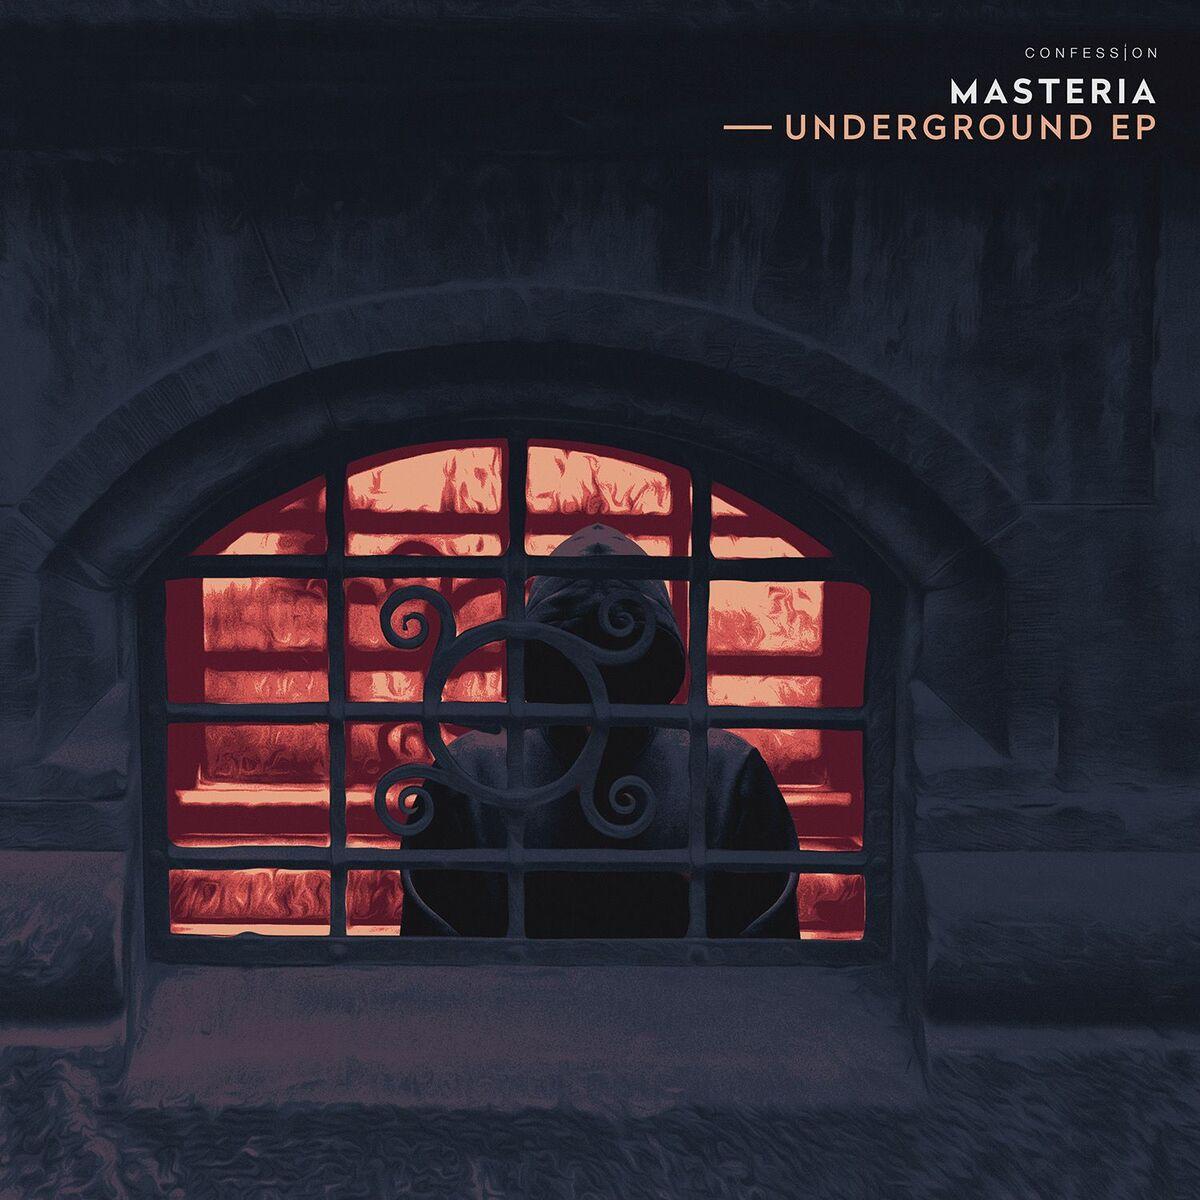 Masteria Underground EP